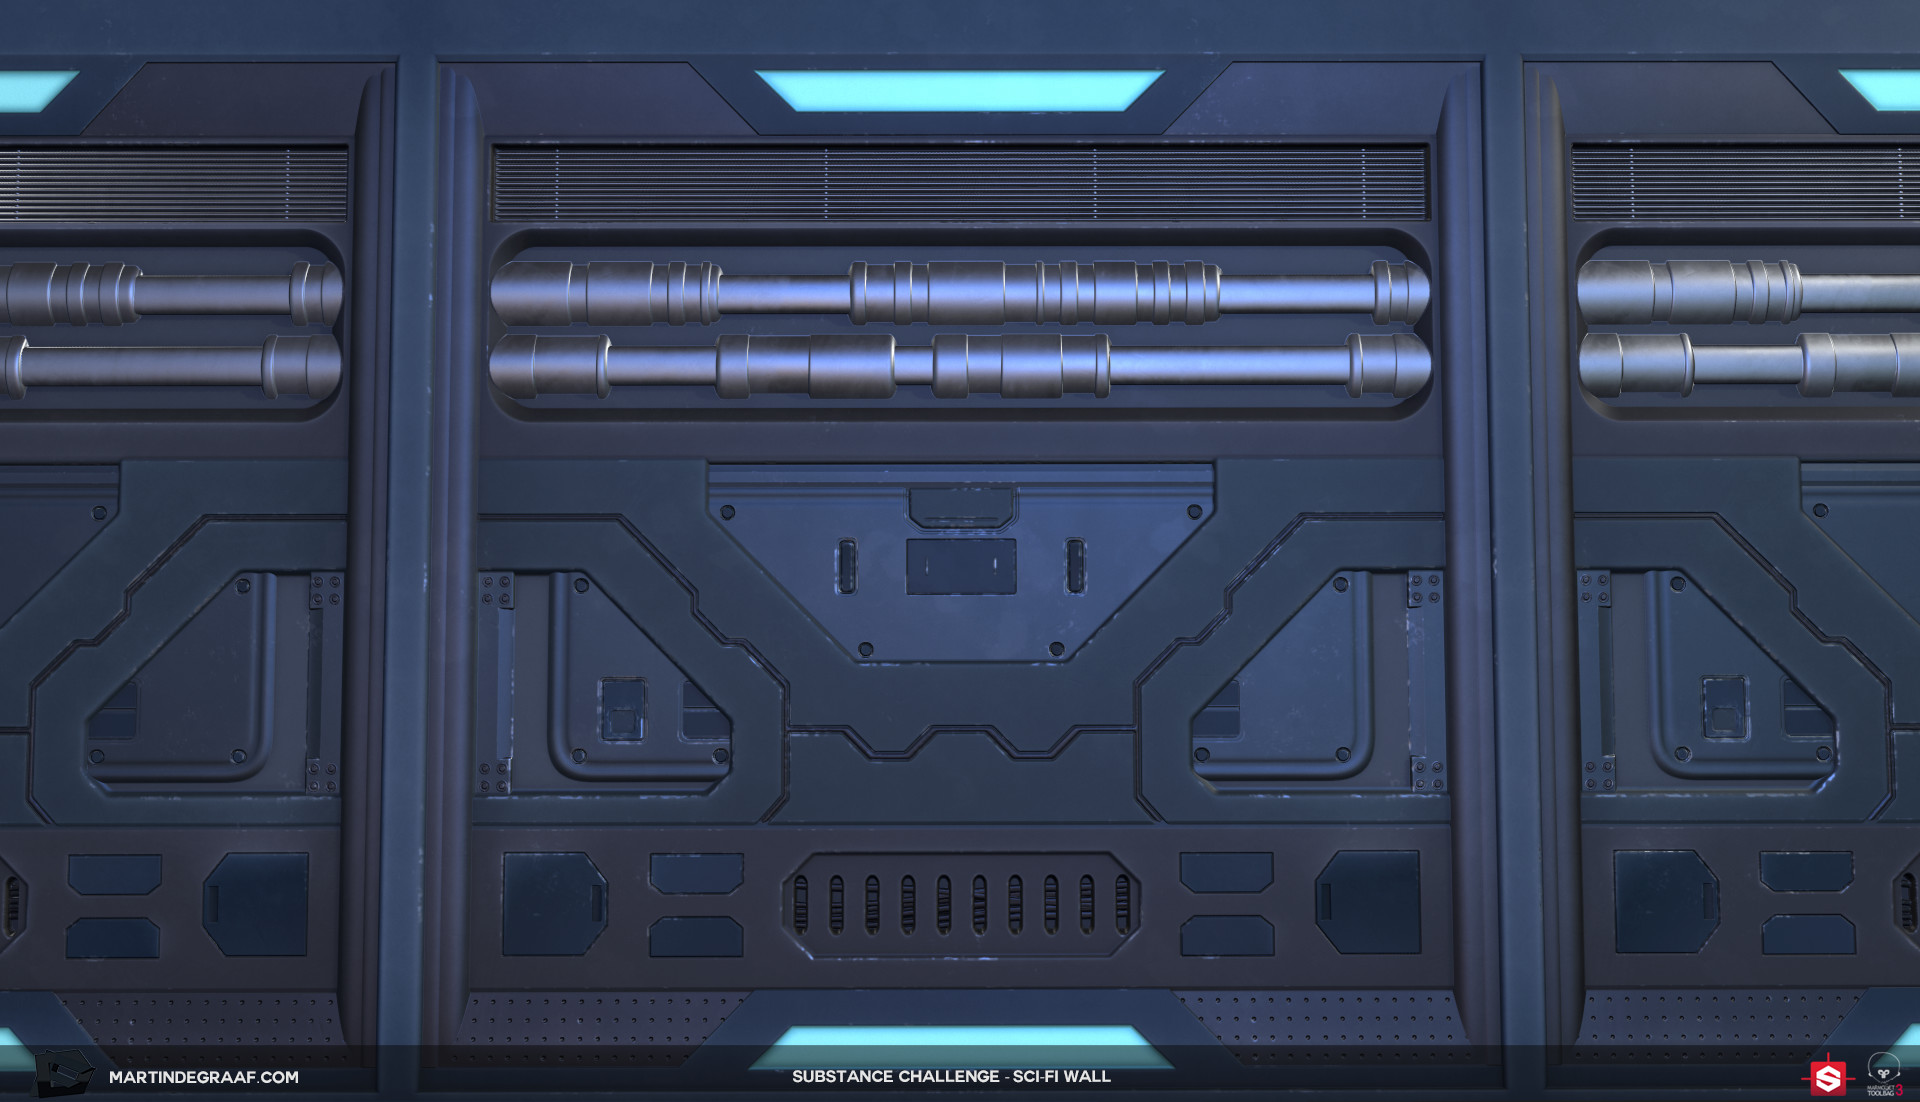 Martin de graaf substance challenge sci fi wall substance plane2 martin de graaf 2017